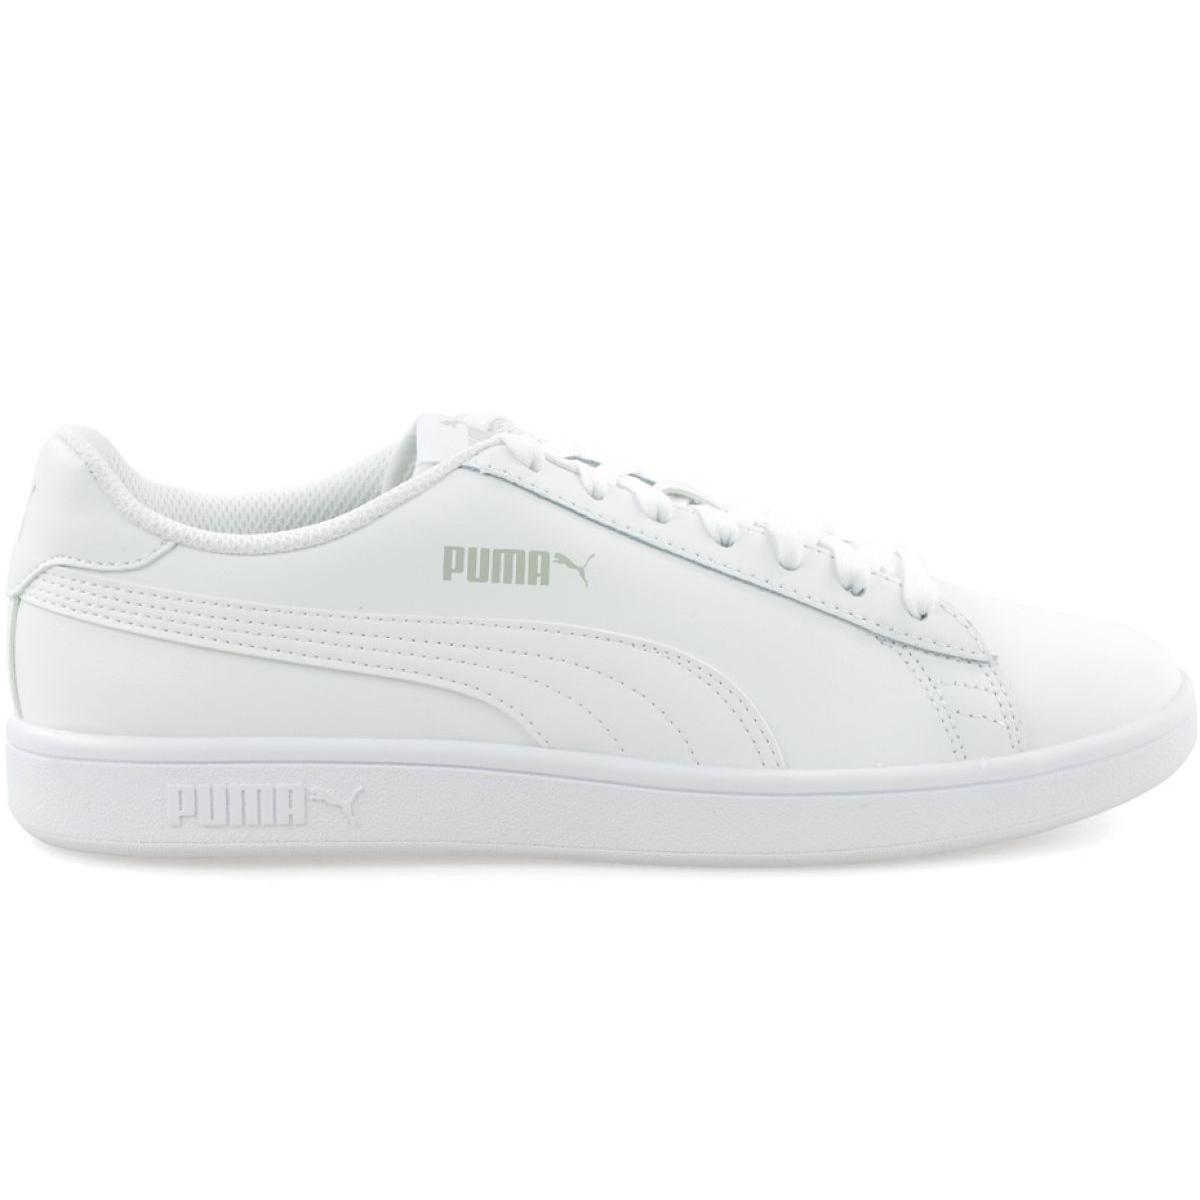 Shoes Puma Smash v2 LM 365215 07 white